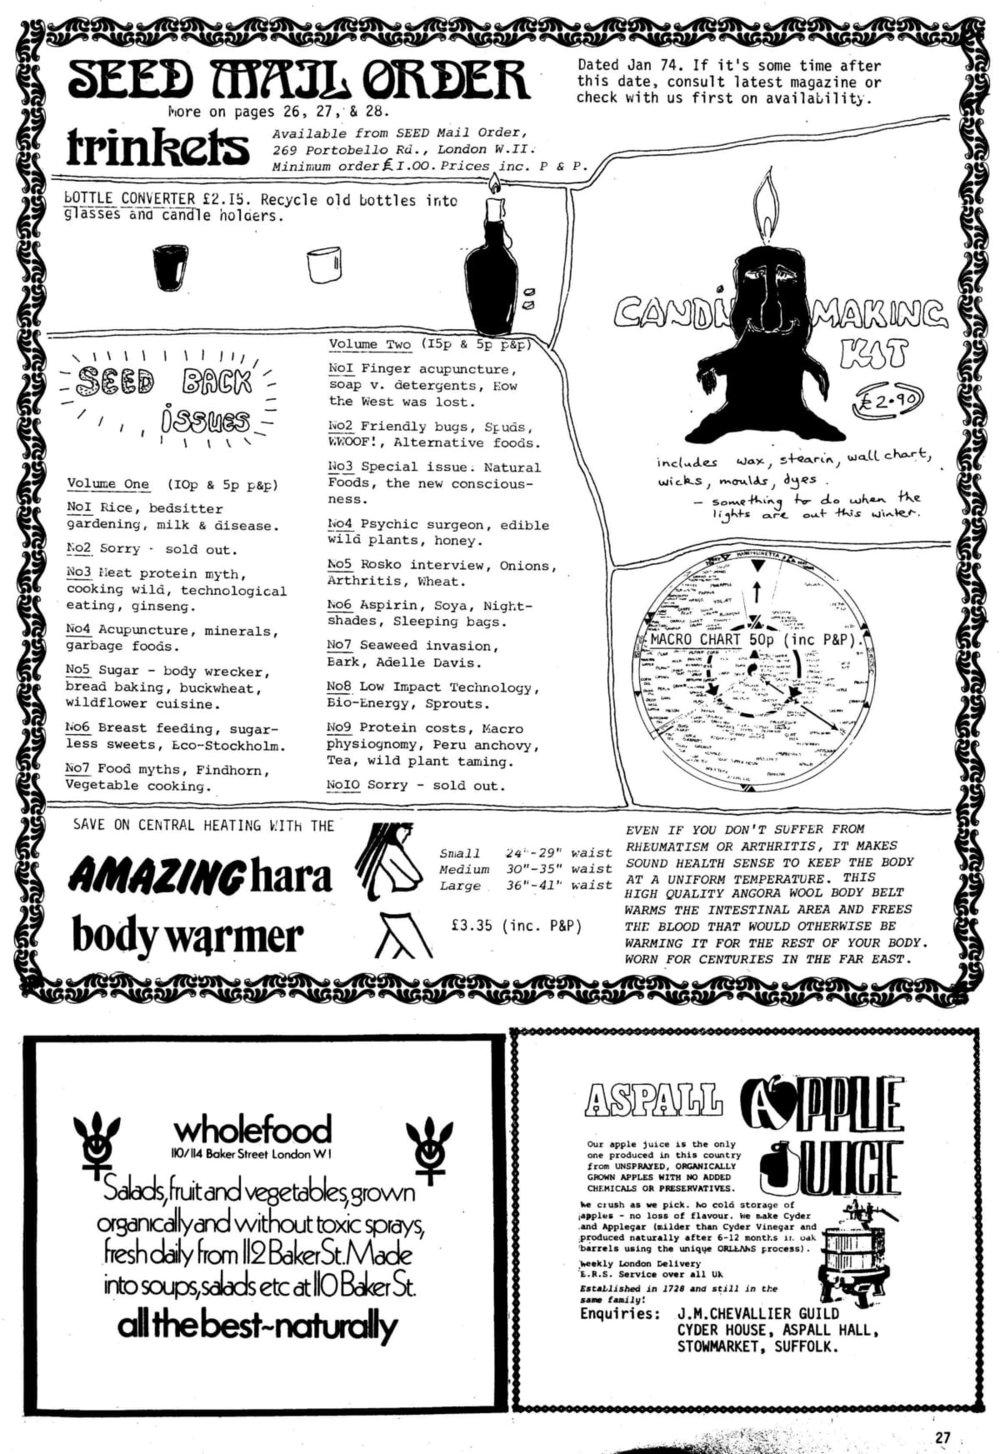 seed-v3-n1-jan1974-27.jpg